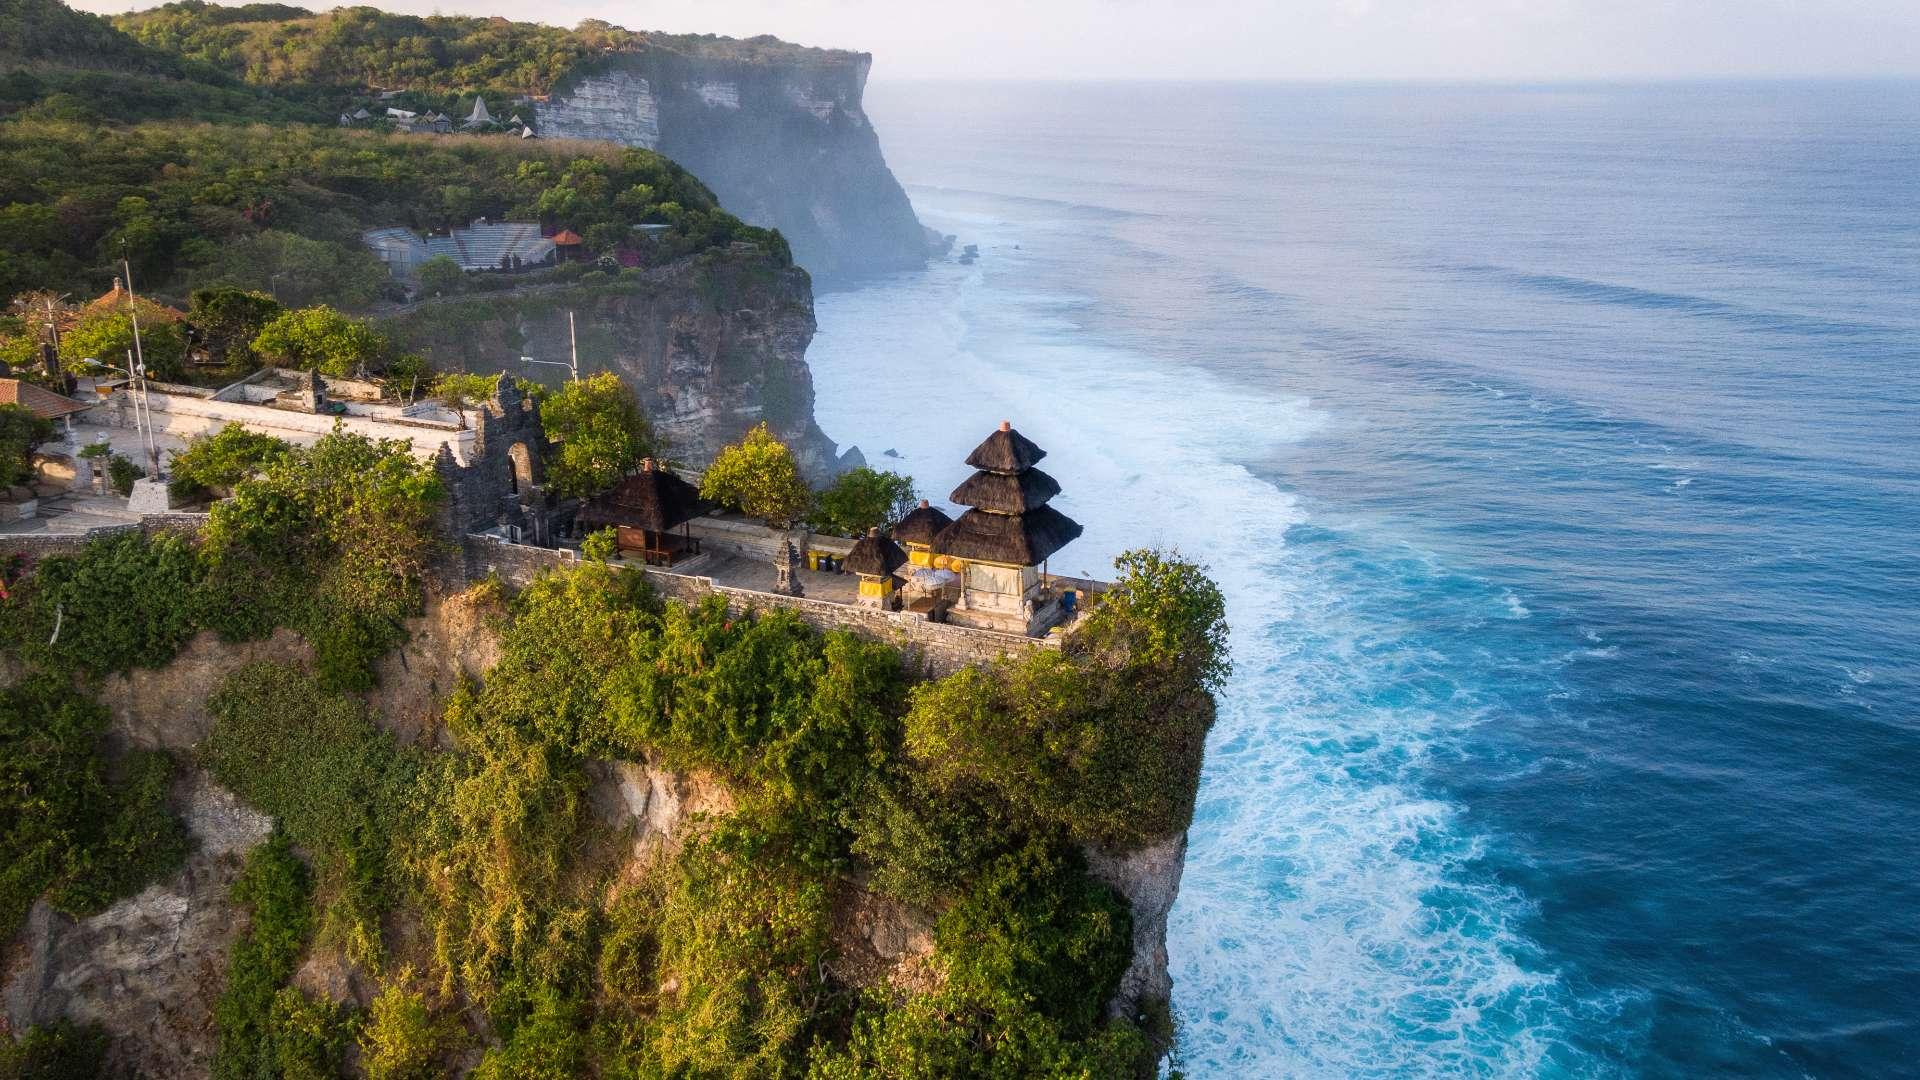 Uluwatu temple and ocean cliff